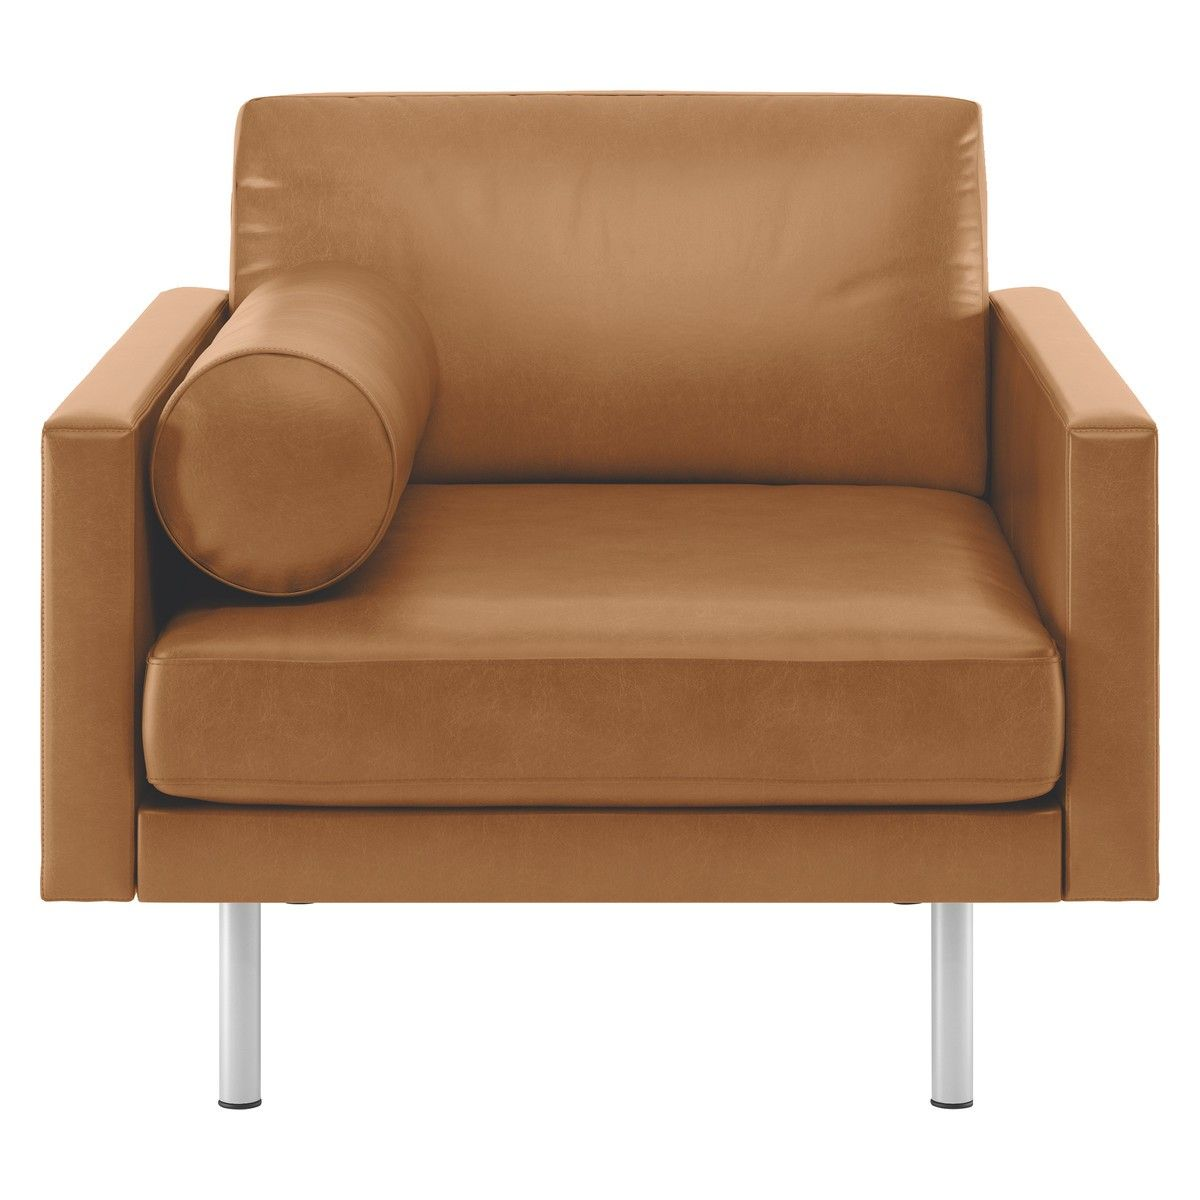 SPENCER Mid tan leather armchair, metal legs